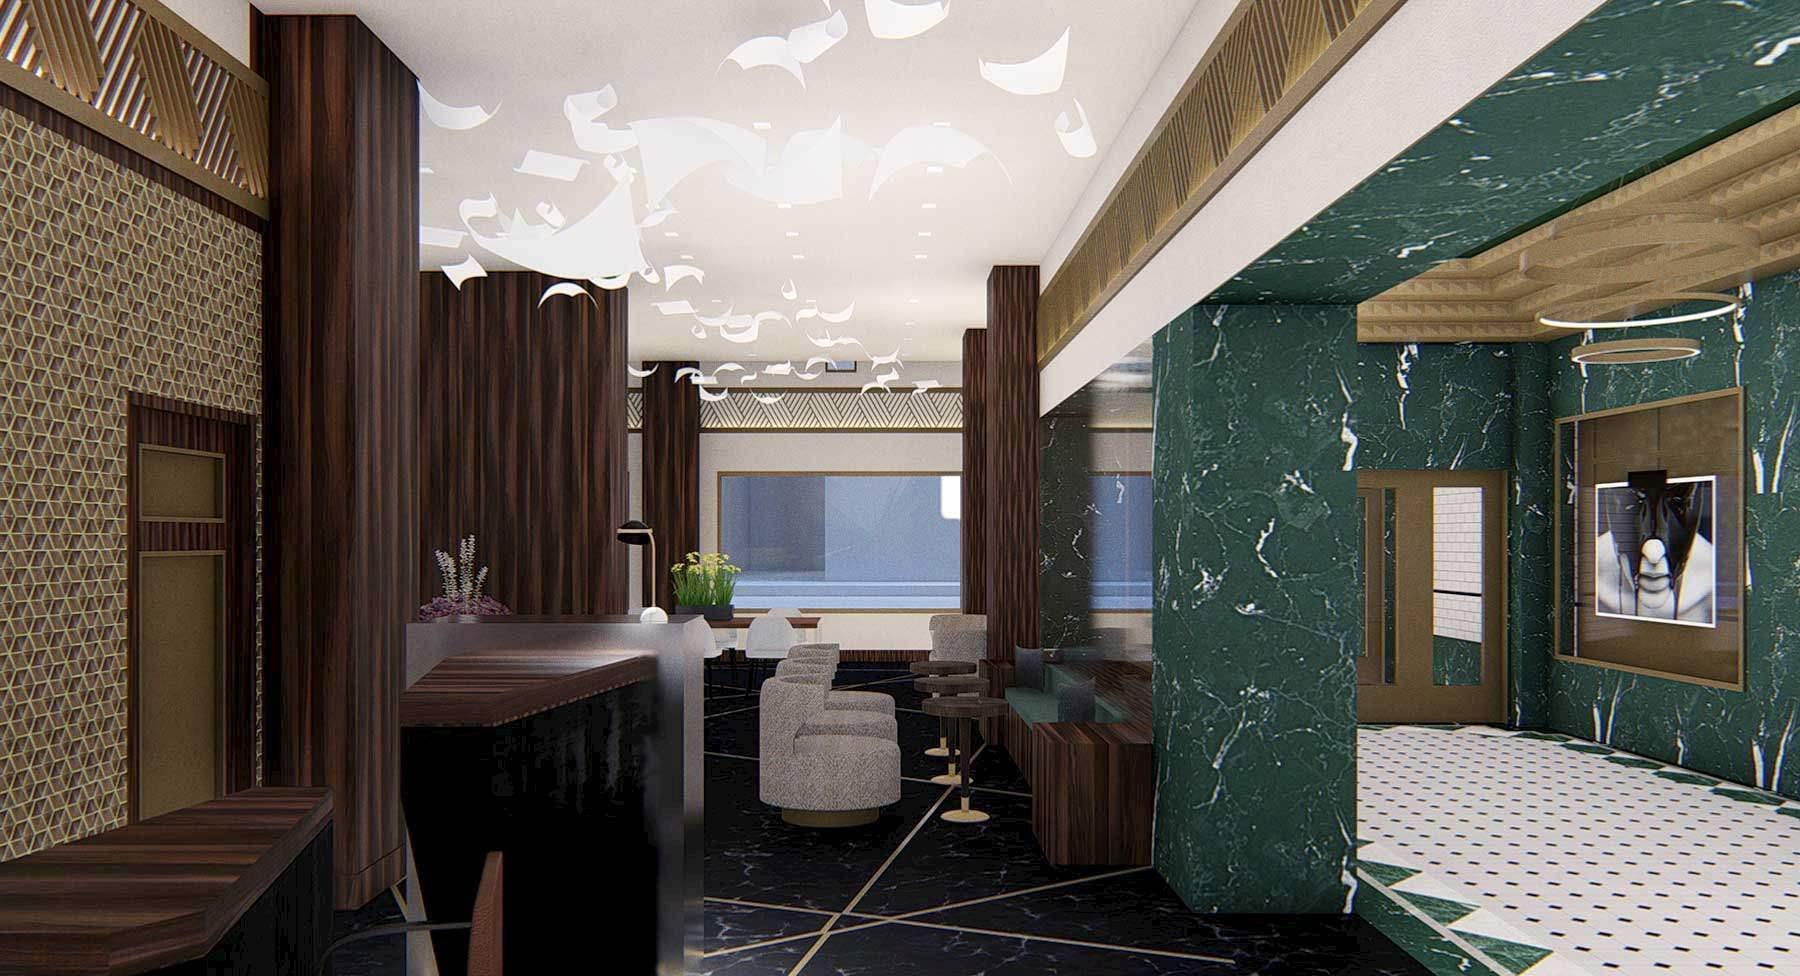 Sinclairfort Worth Hotel, Texas